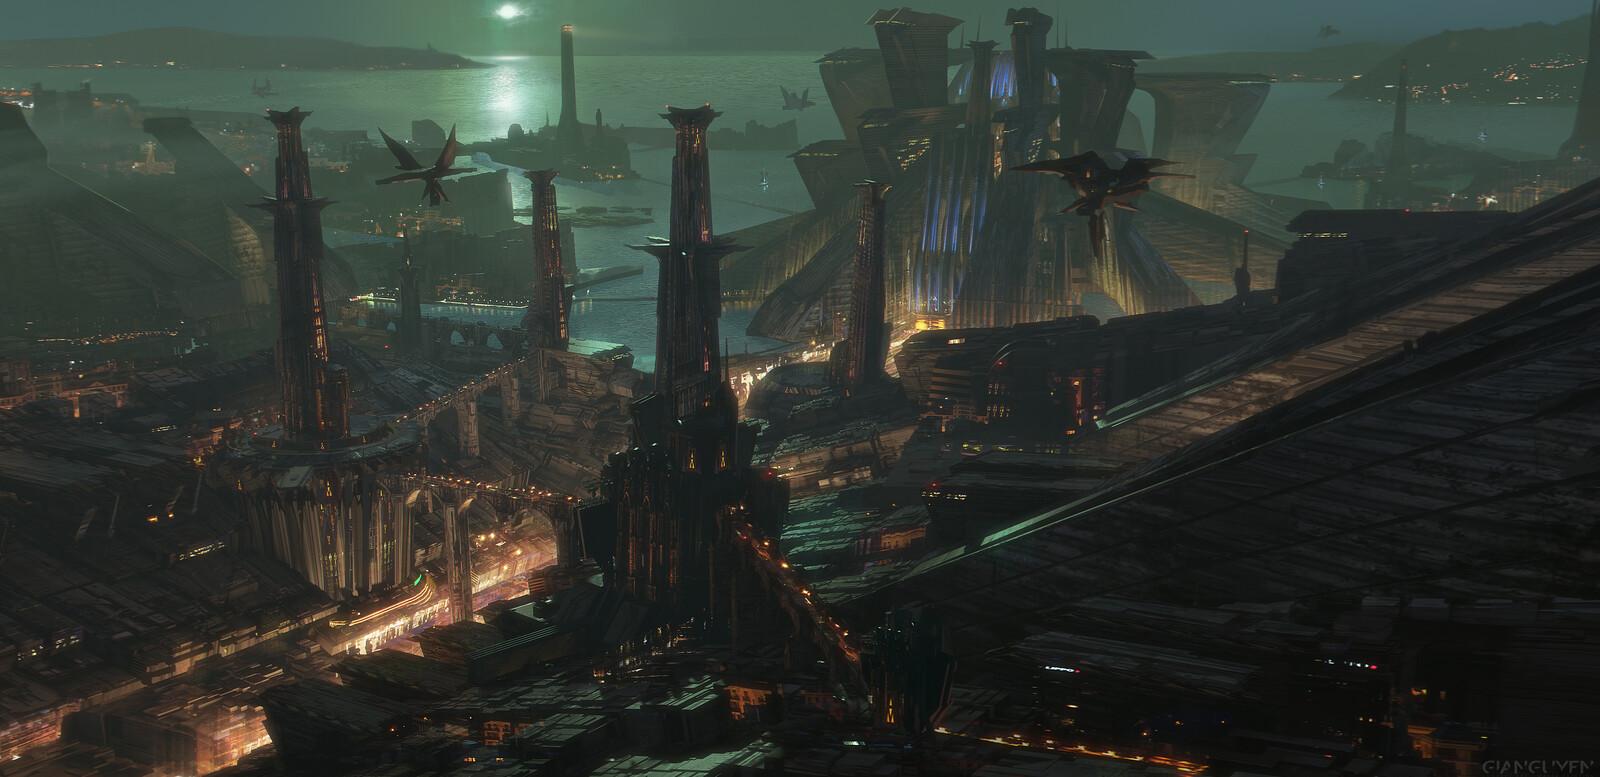 Fantasy Environments